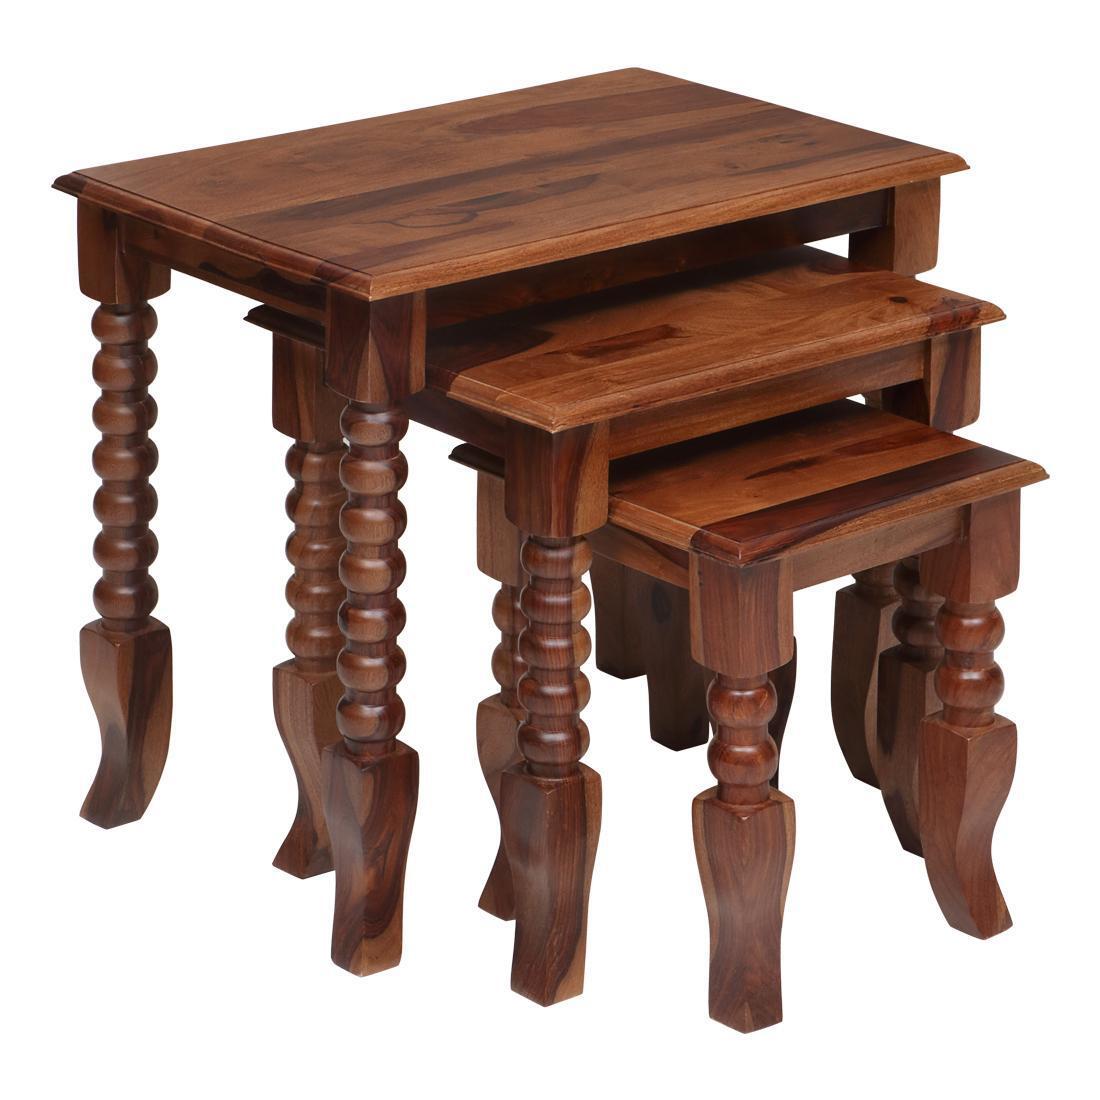 Solidwood Nesting Table Set Of 3 (Honey)